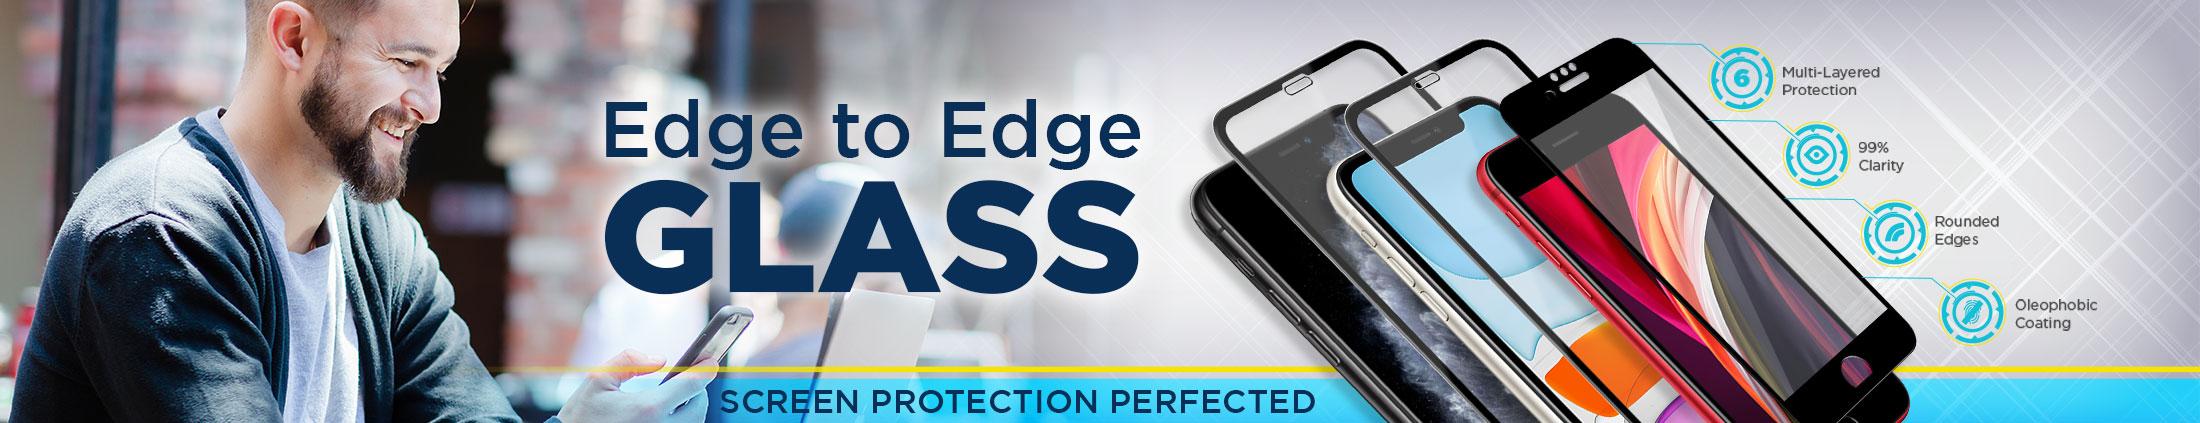 Edge to Edge Glass